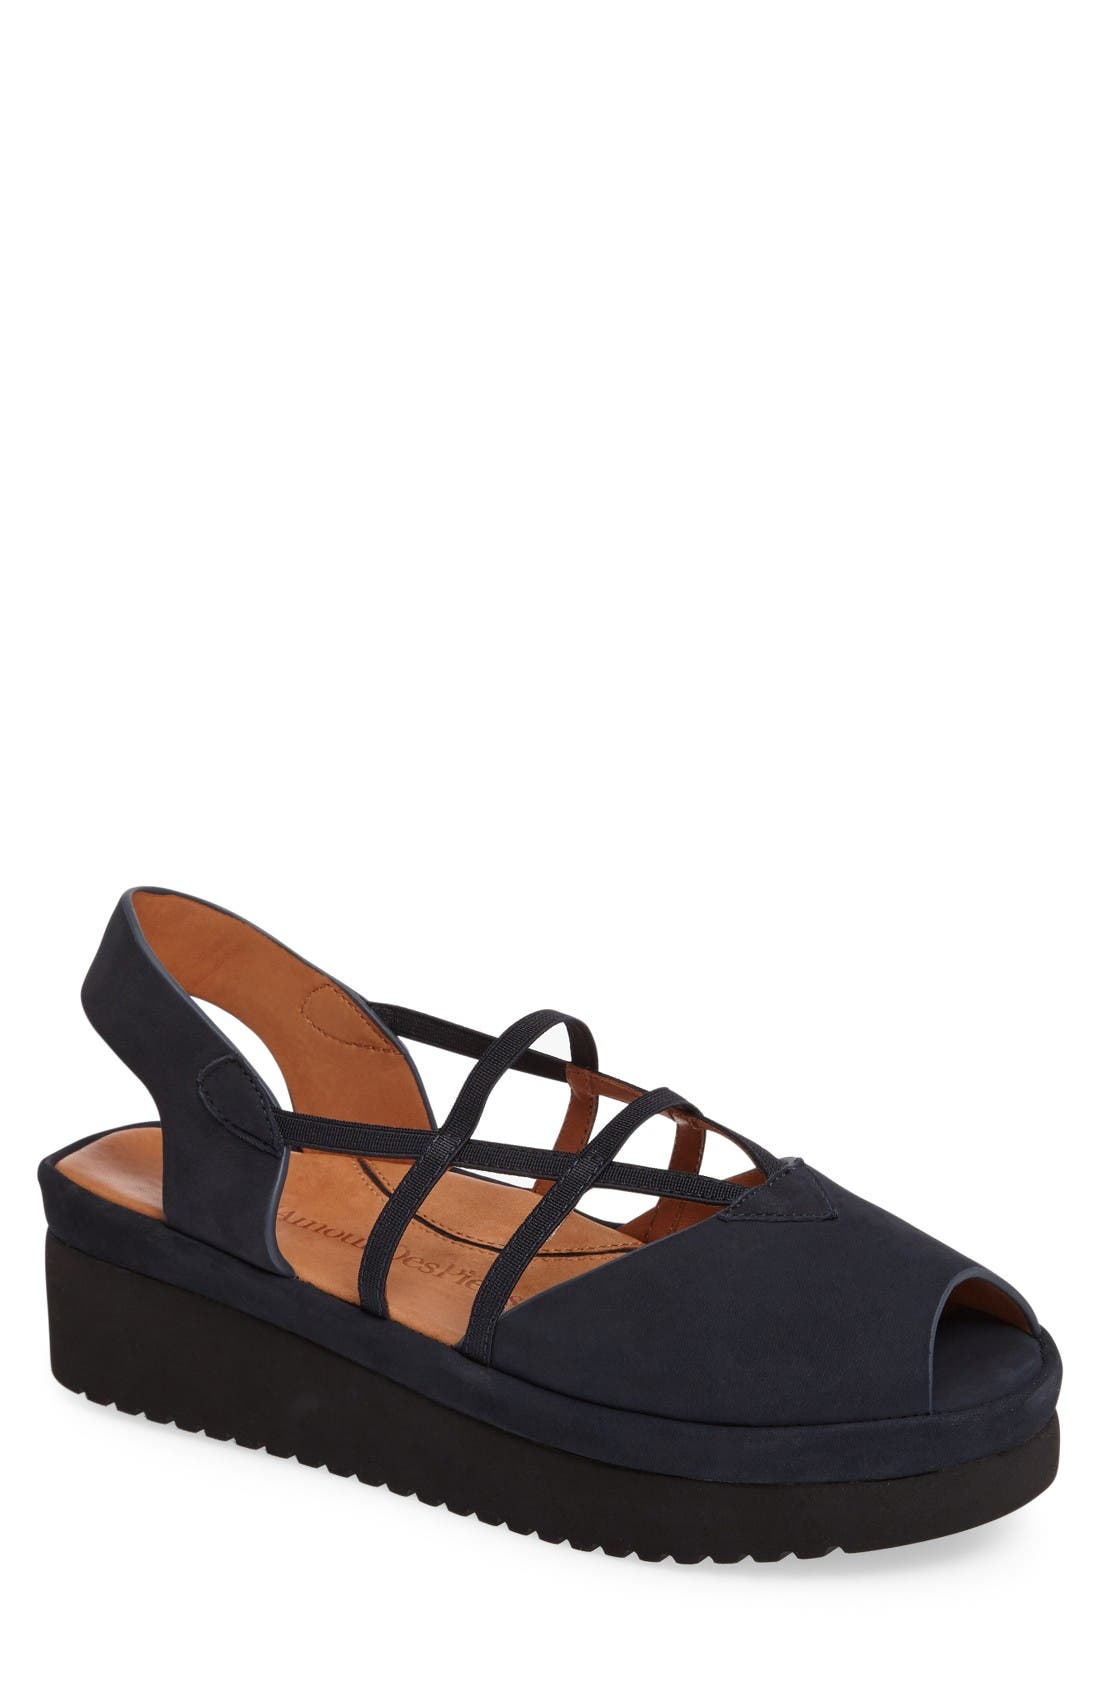 Adelais Suede Wedge Sandals 7SQfp